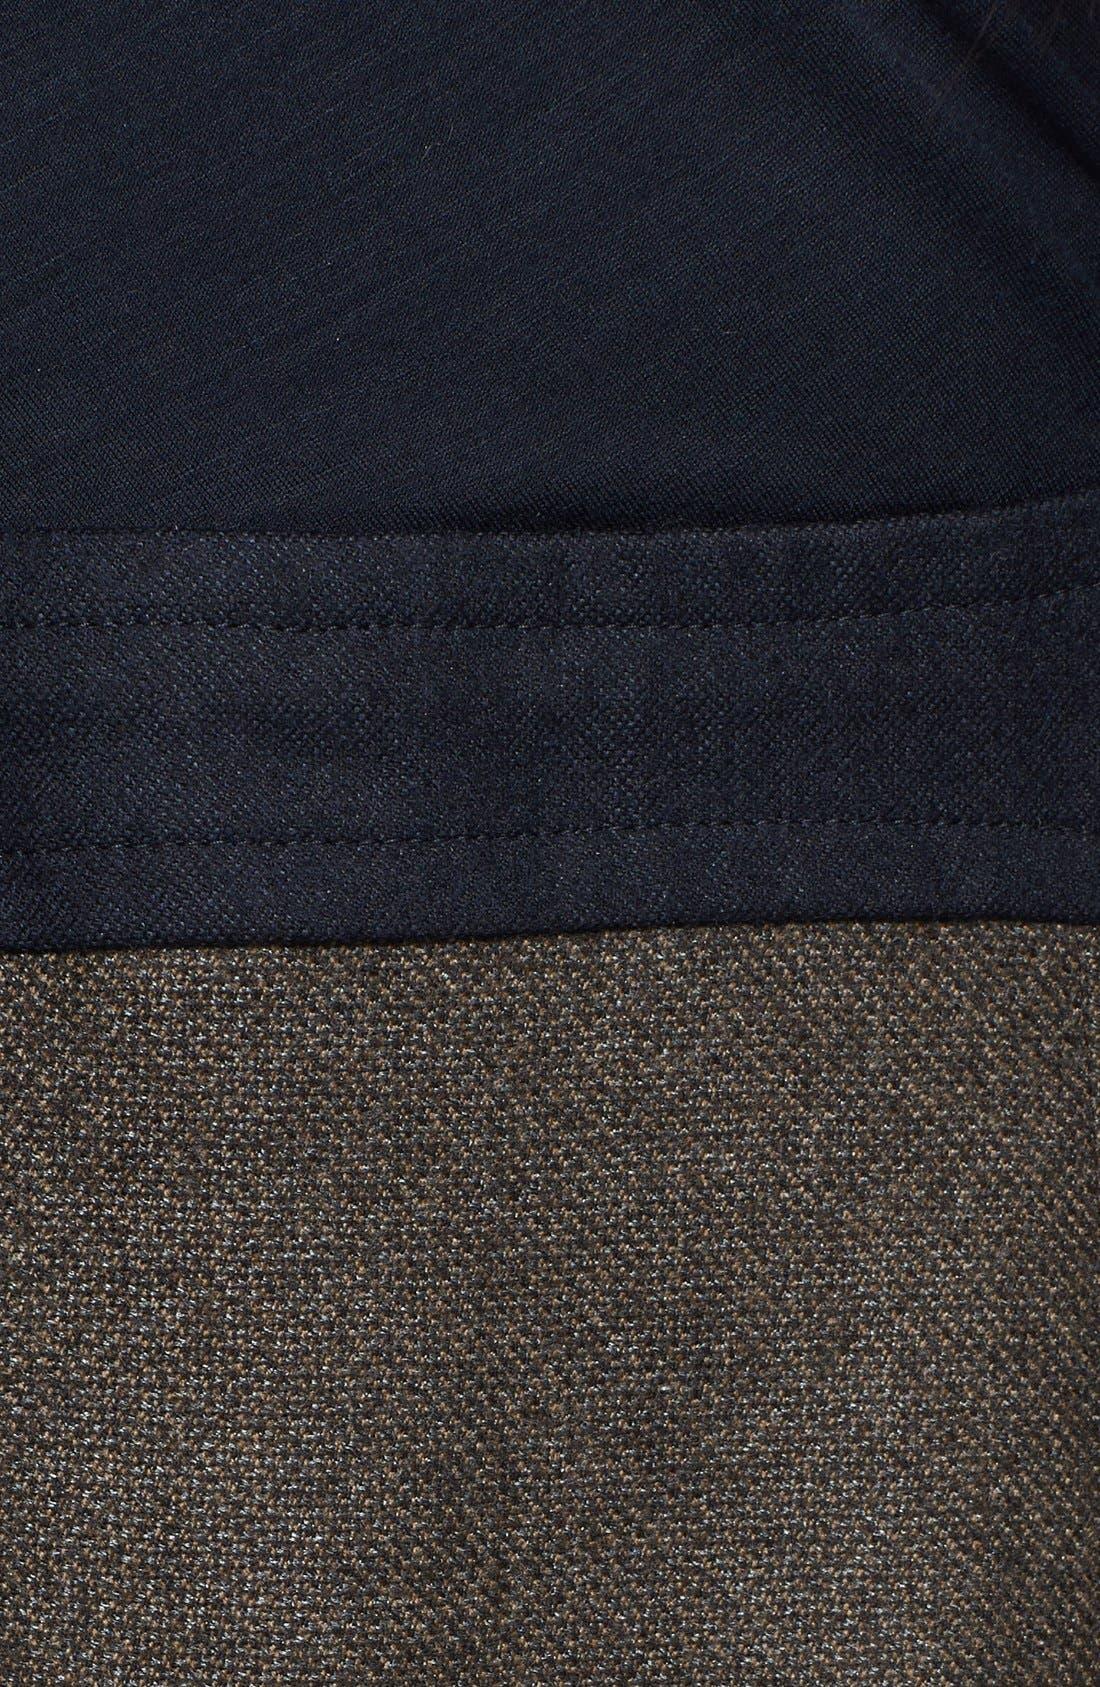 Alternate Image 3  - Max Mara 'Flou' Colorblock Dress